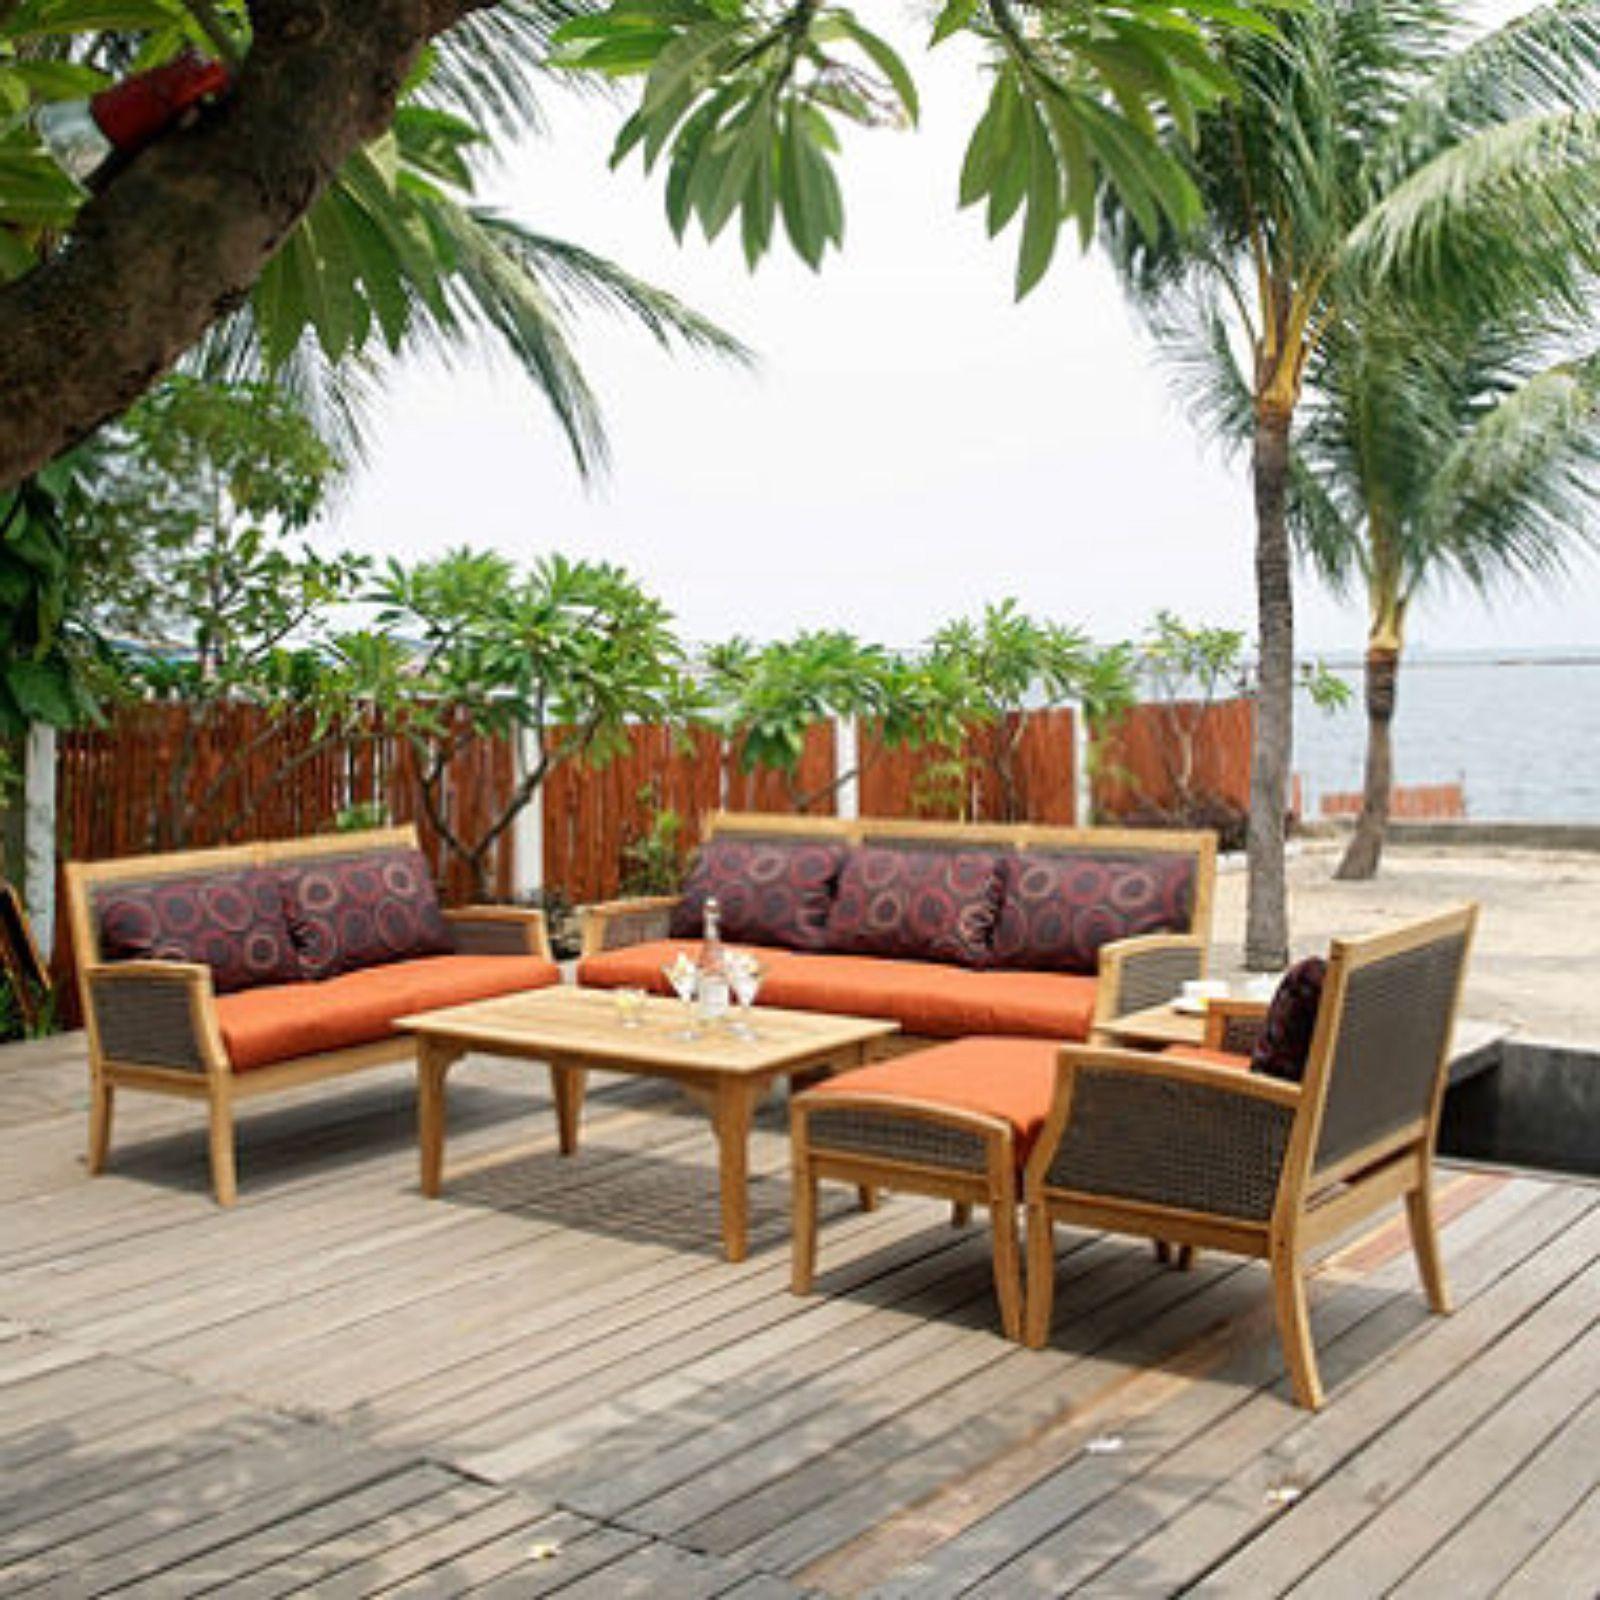 Kmart Patio Furniture Cushions Outdoor patio decor